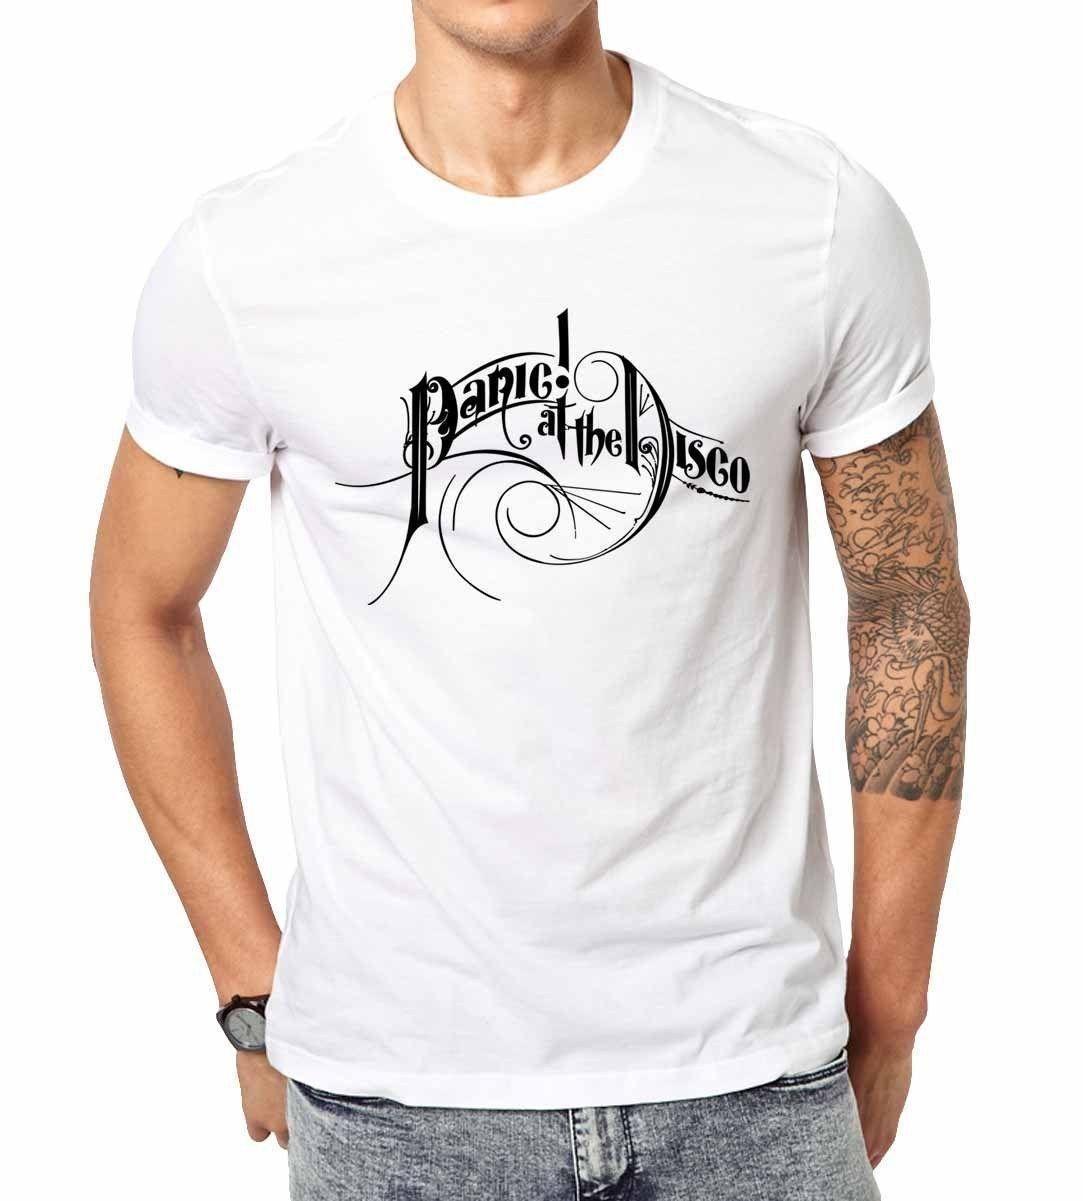 Panic At The Disco Tshirt Interesting T Shirt Designs T Shirts Cool